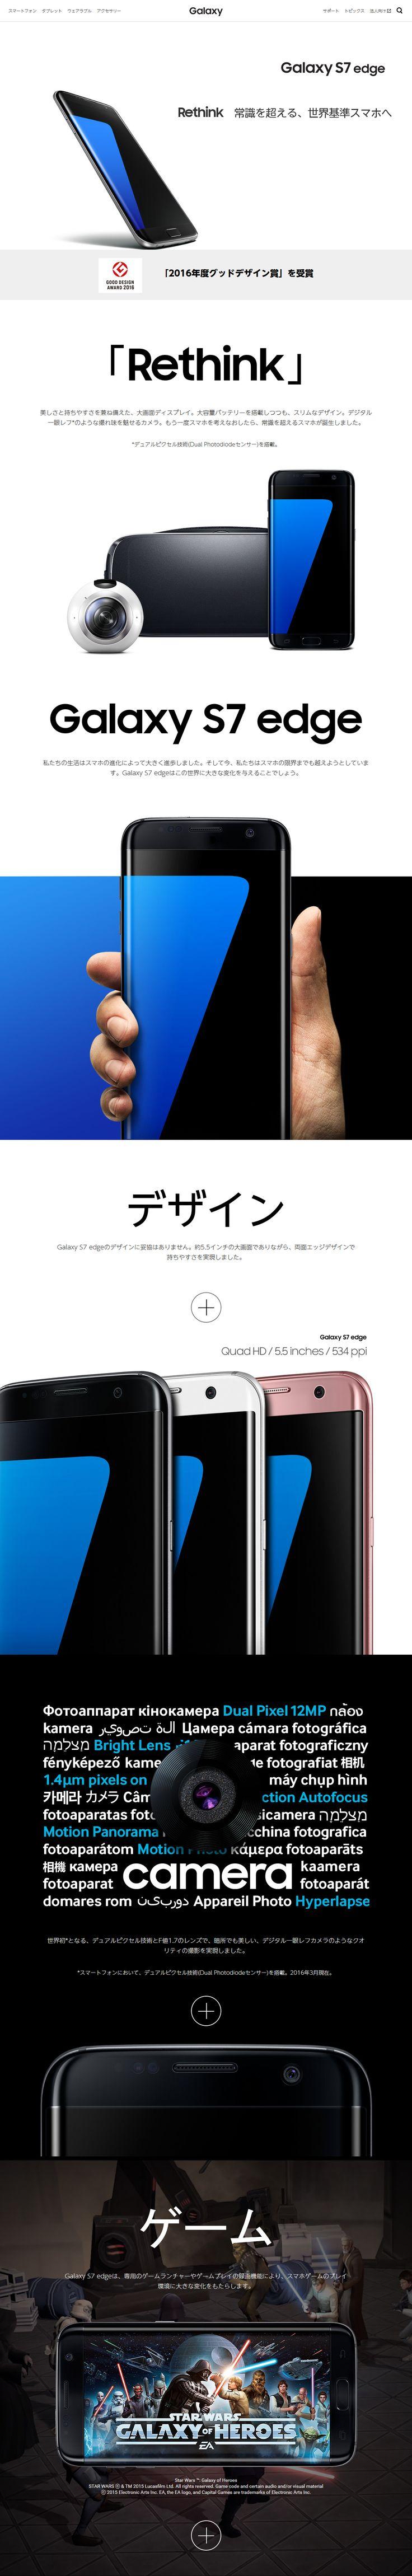 Galaxy S7 edge【家電・パソコン・通信関連】のLPデザイン。WEBデザイナーさん必見!ランディングページのデザイン参考に(シンプル系)